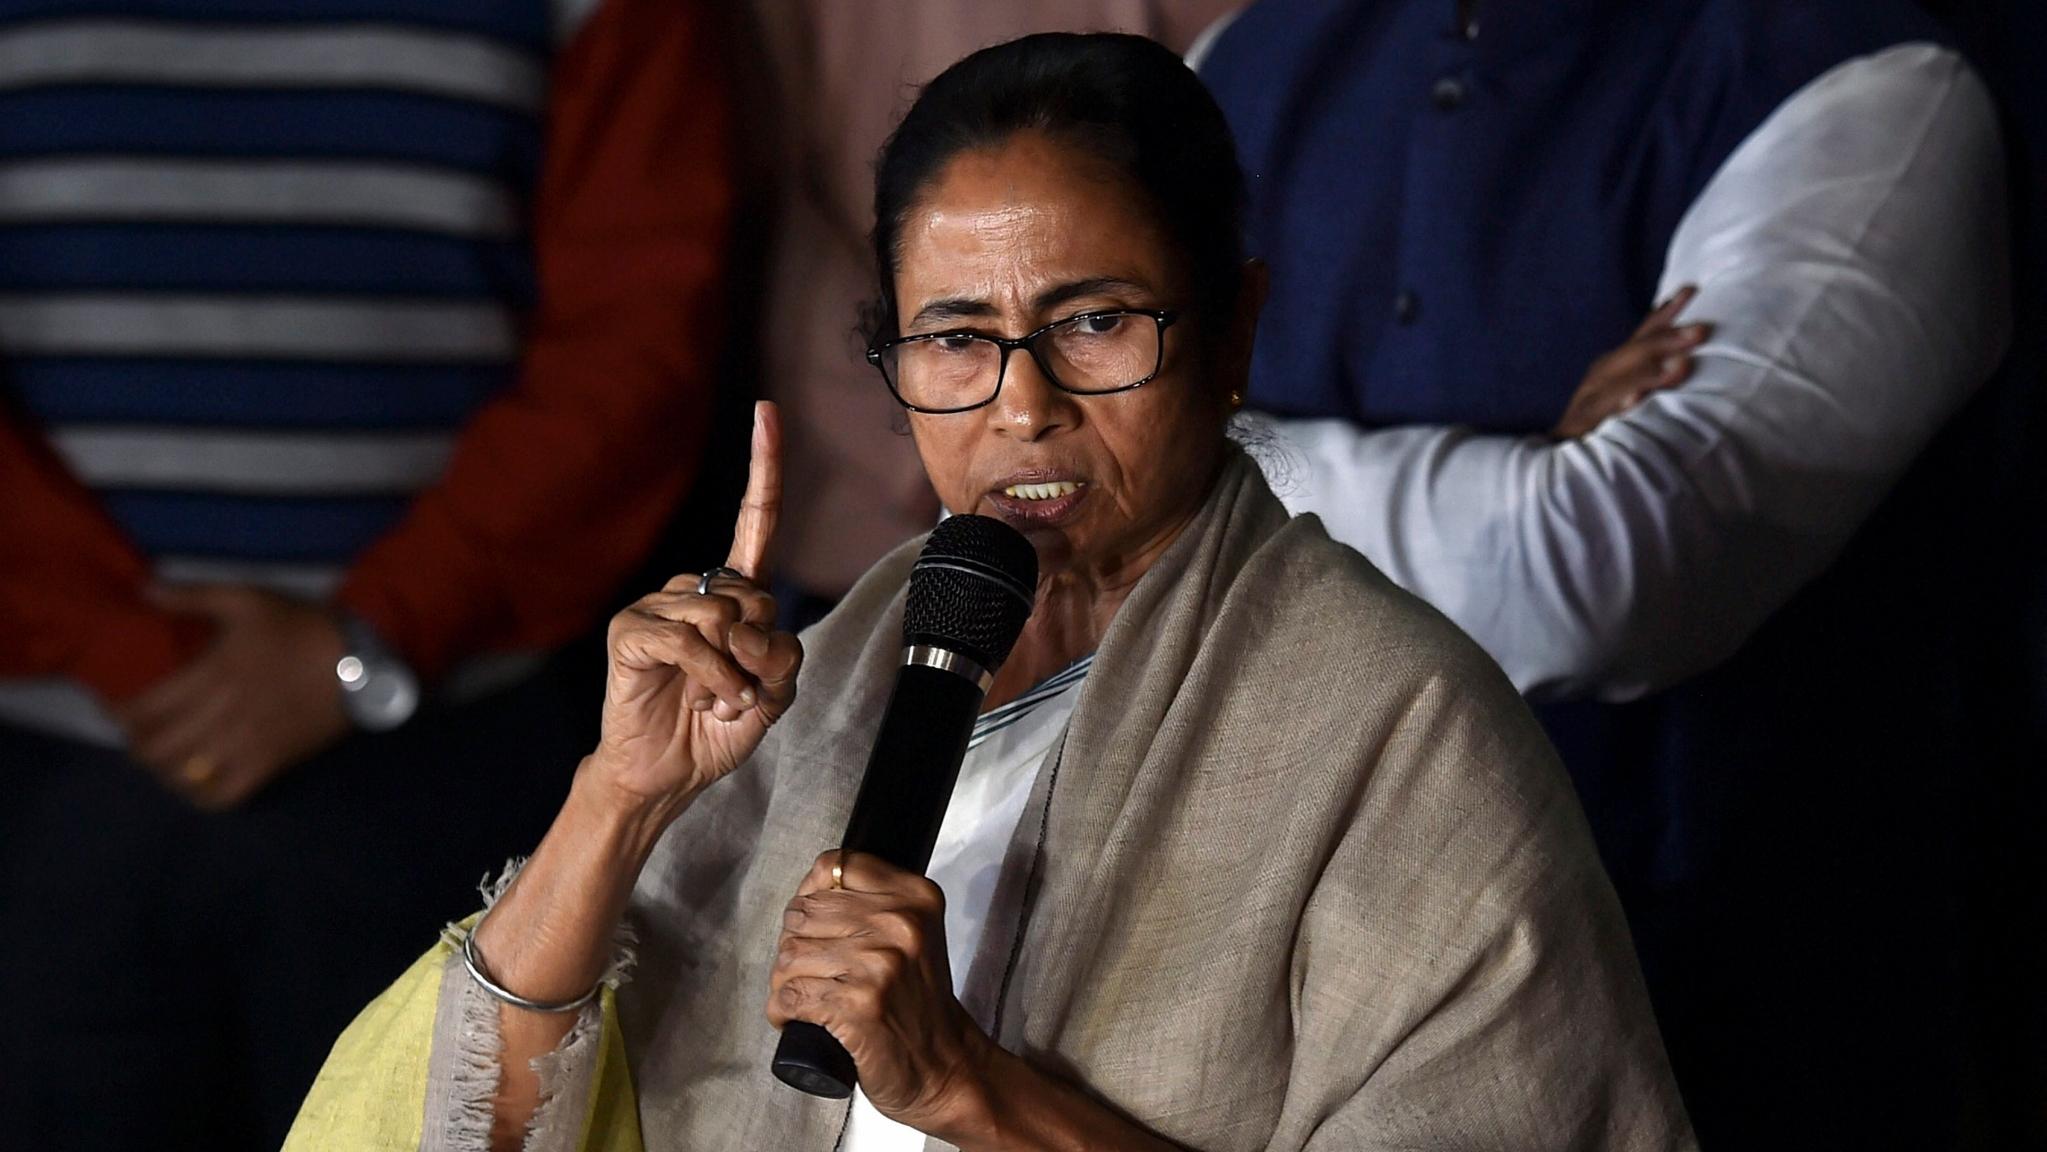 QKolkata: Mamata's List Of Trinamool Candidates For LS & More